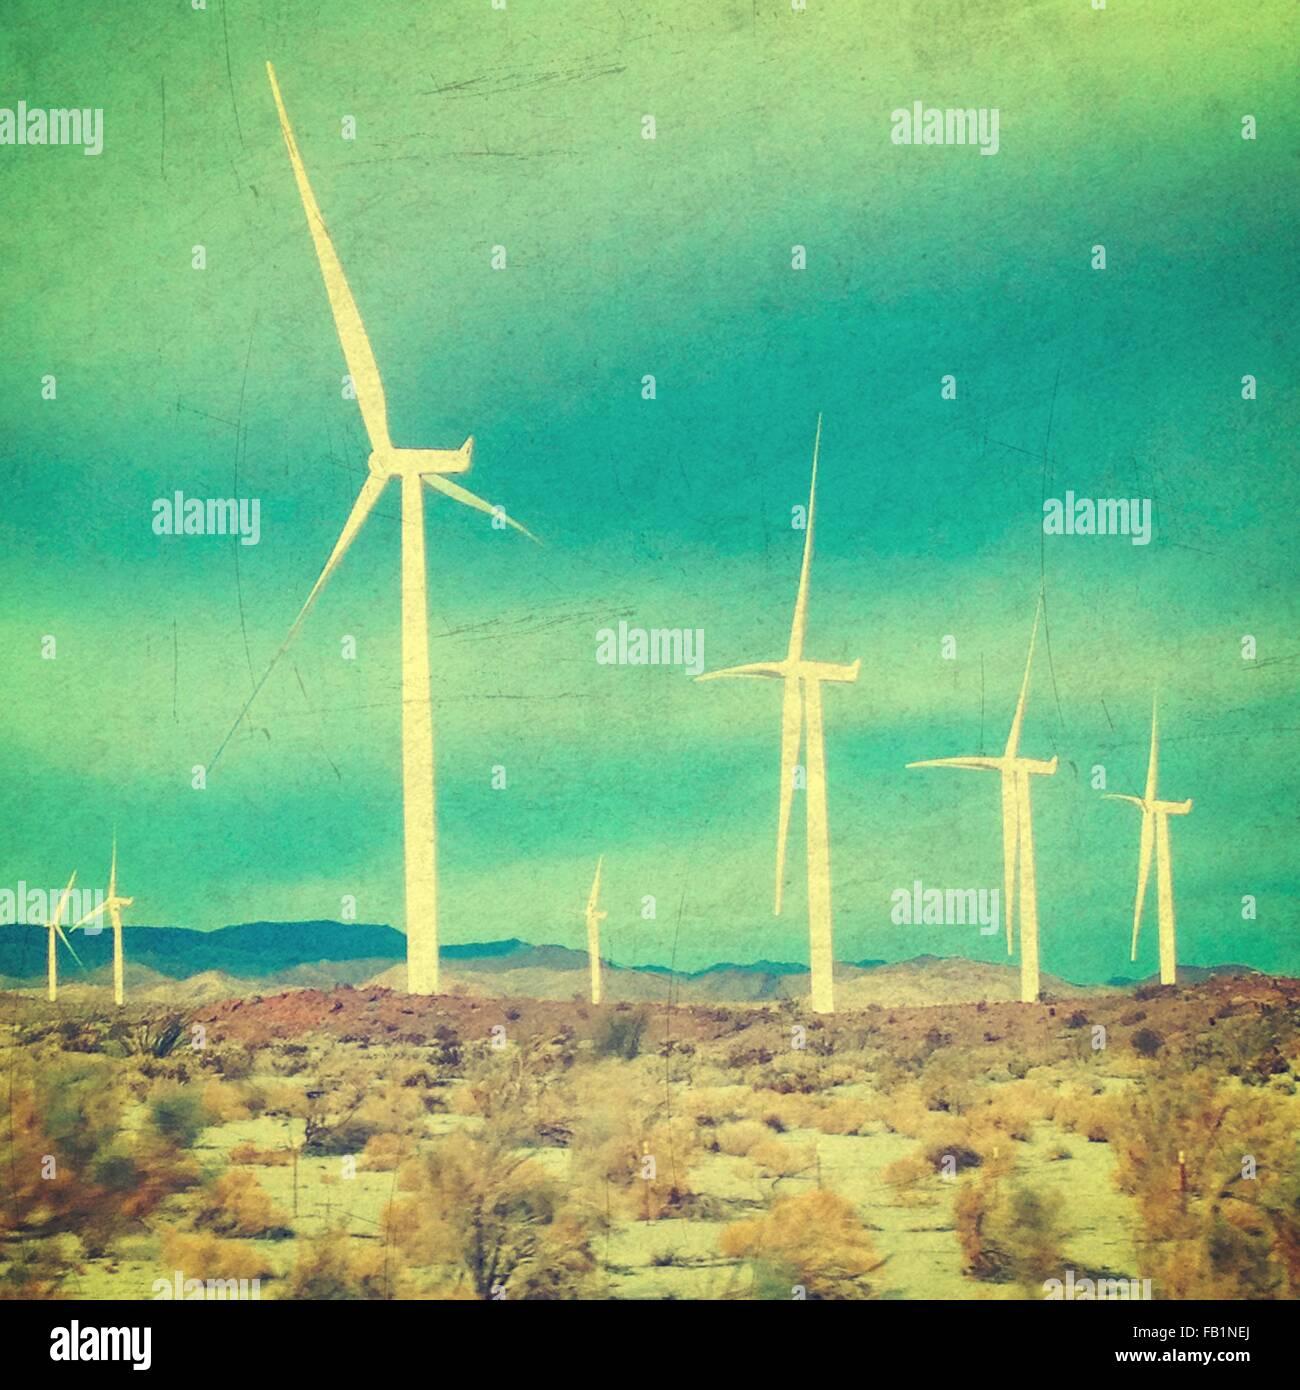 windmills in the desert - Stock Image